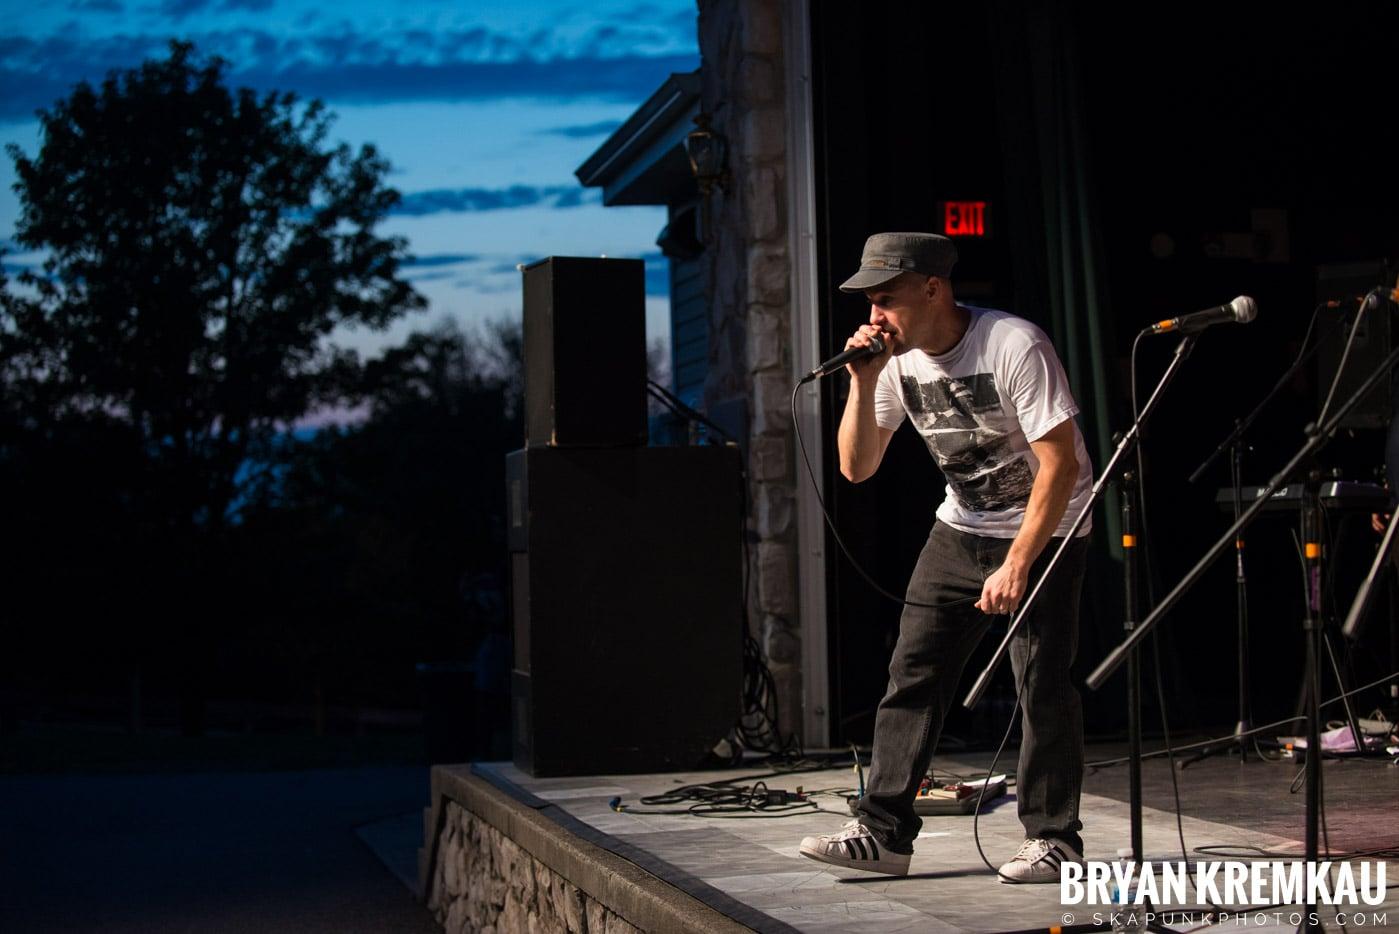 The Rudie Crew @ Oskar Schindler Performing Arts Center, West Orange, NJ - 8.19.17 (3)